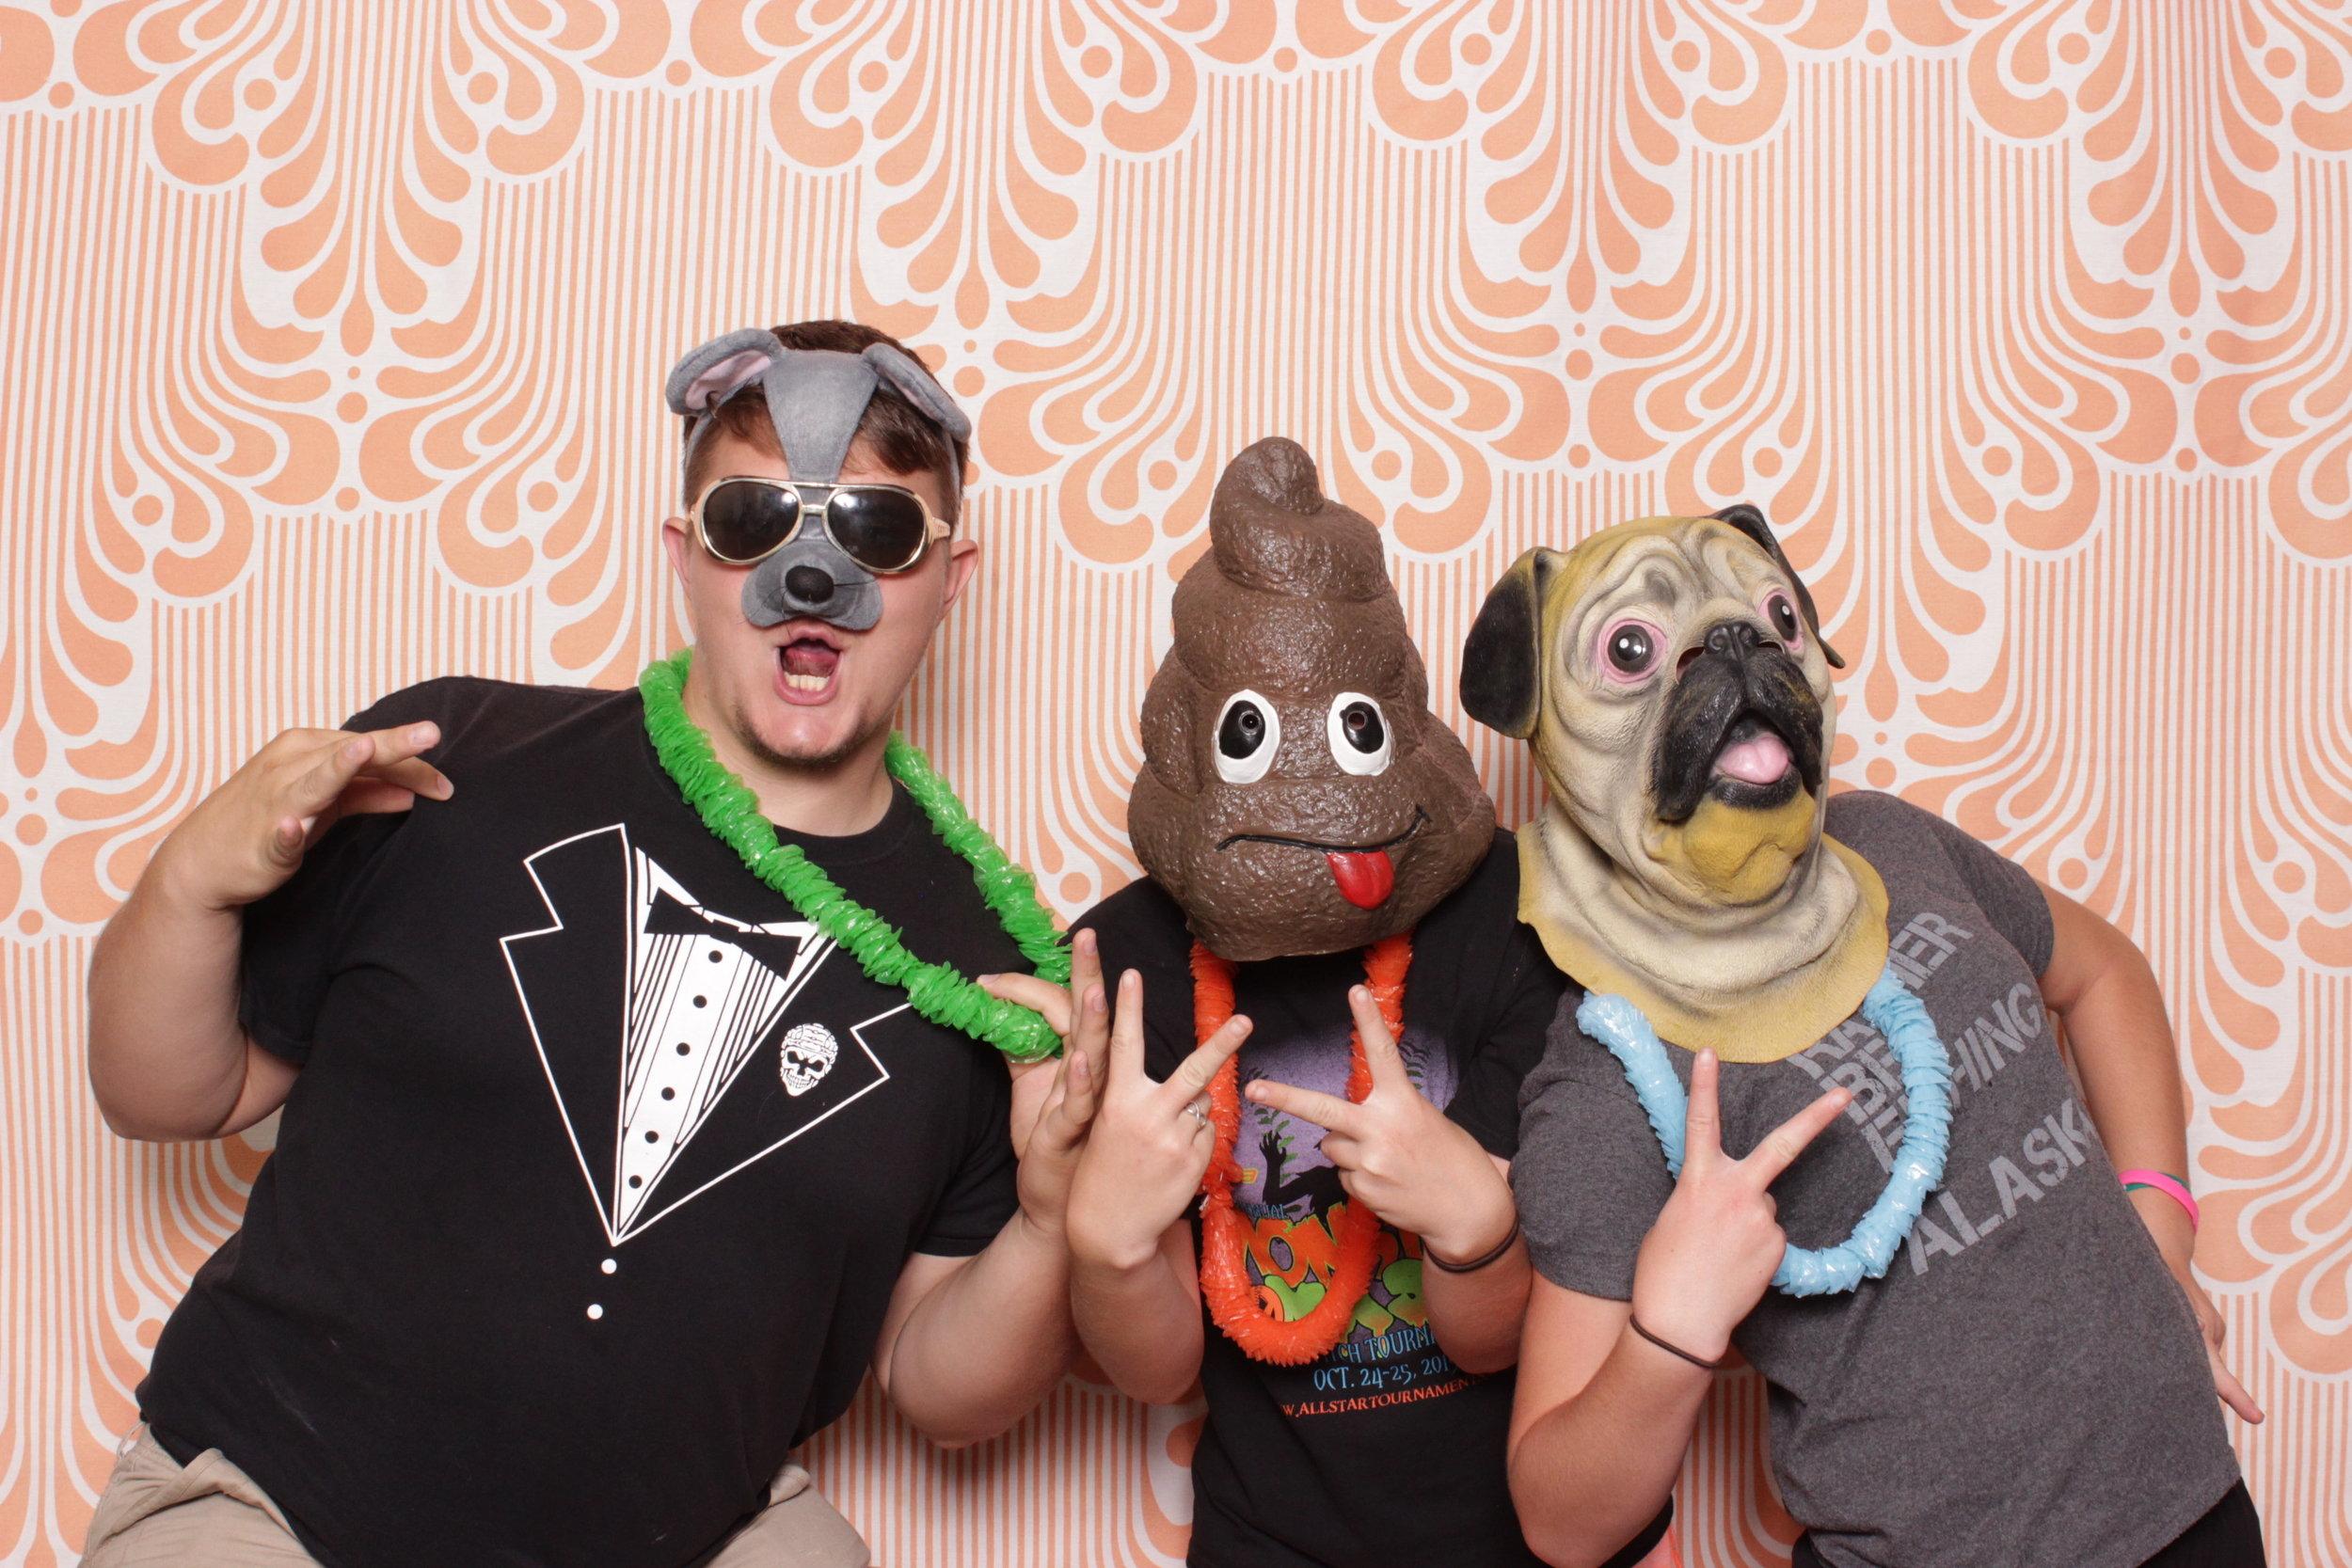 Infinite-hawaiian-luau-party-photo-booth-rental-chico-leaders